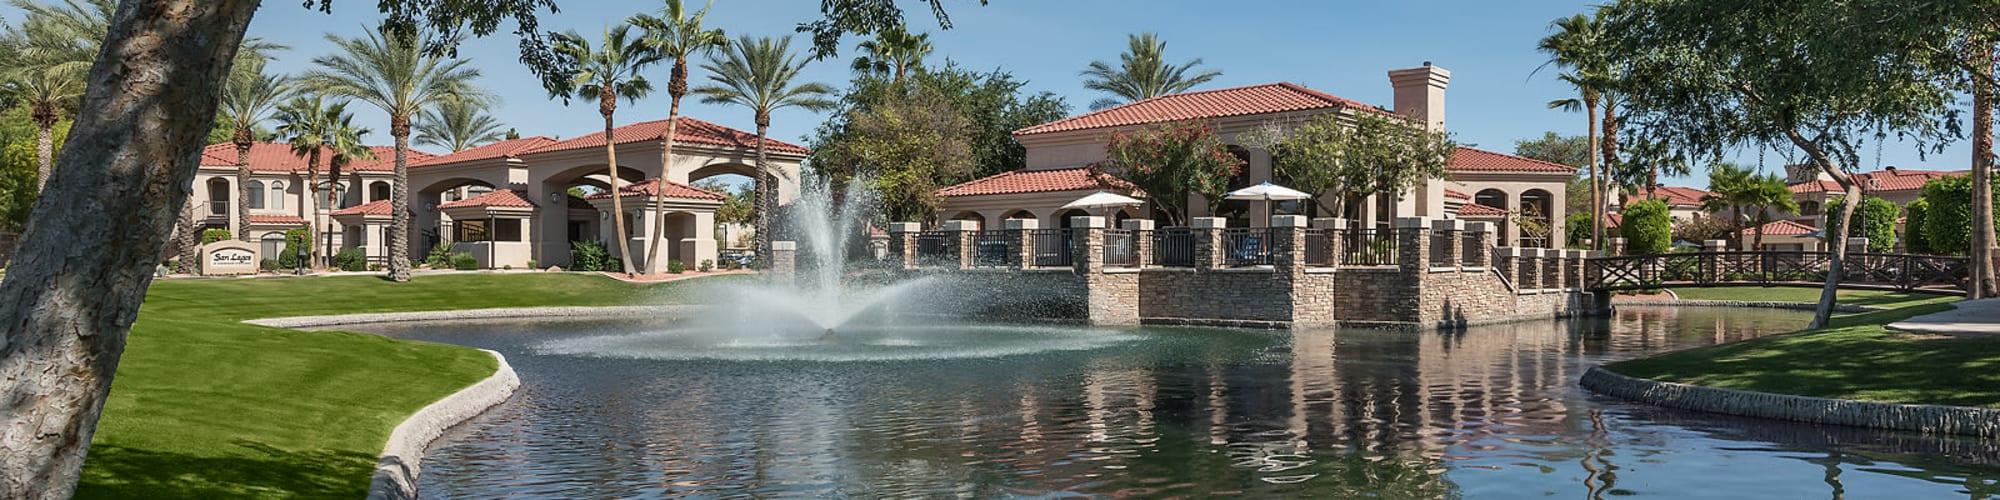 Schedule a tour of San Lagos in Glendale, Arizona